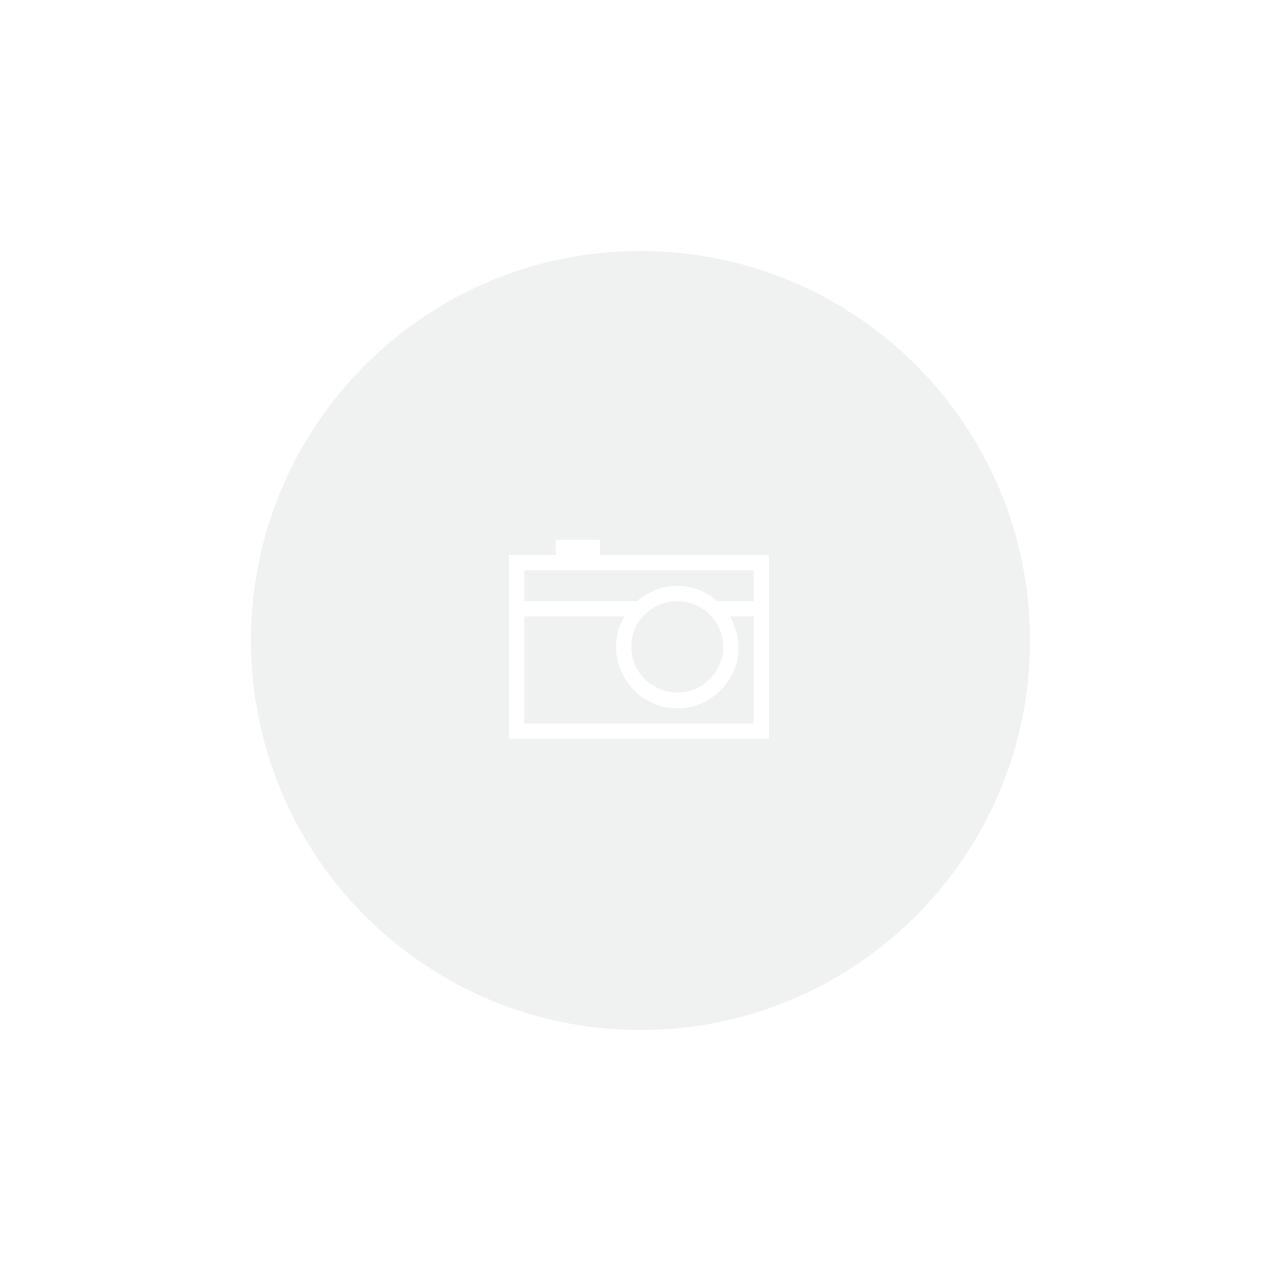 COROA 28D SHIMANO XTR M9000 22 VELOCIDADES (Y1PV28000)